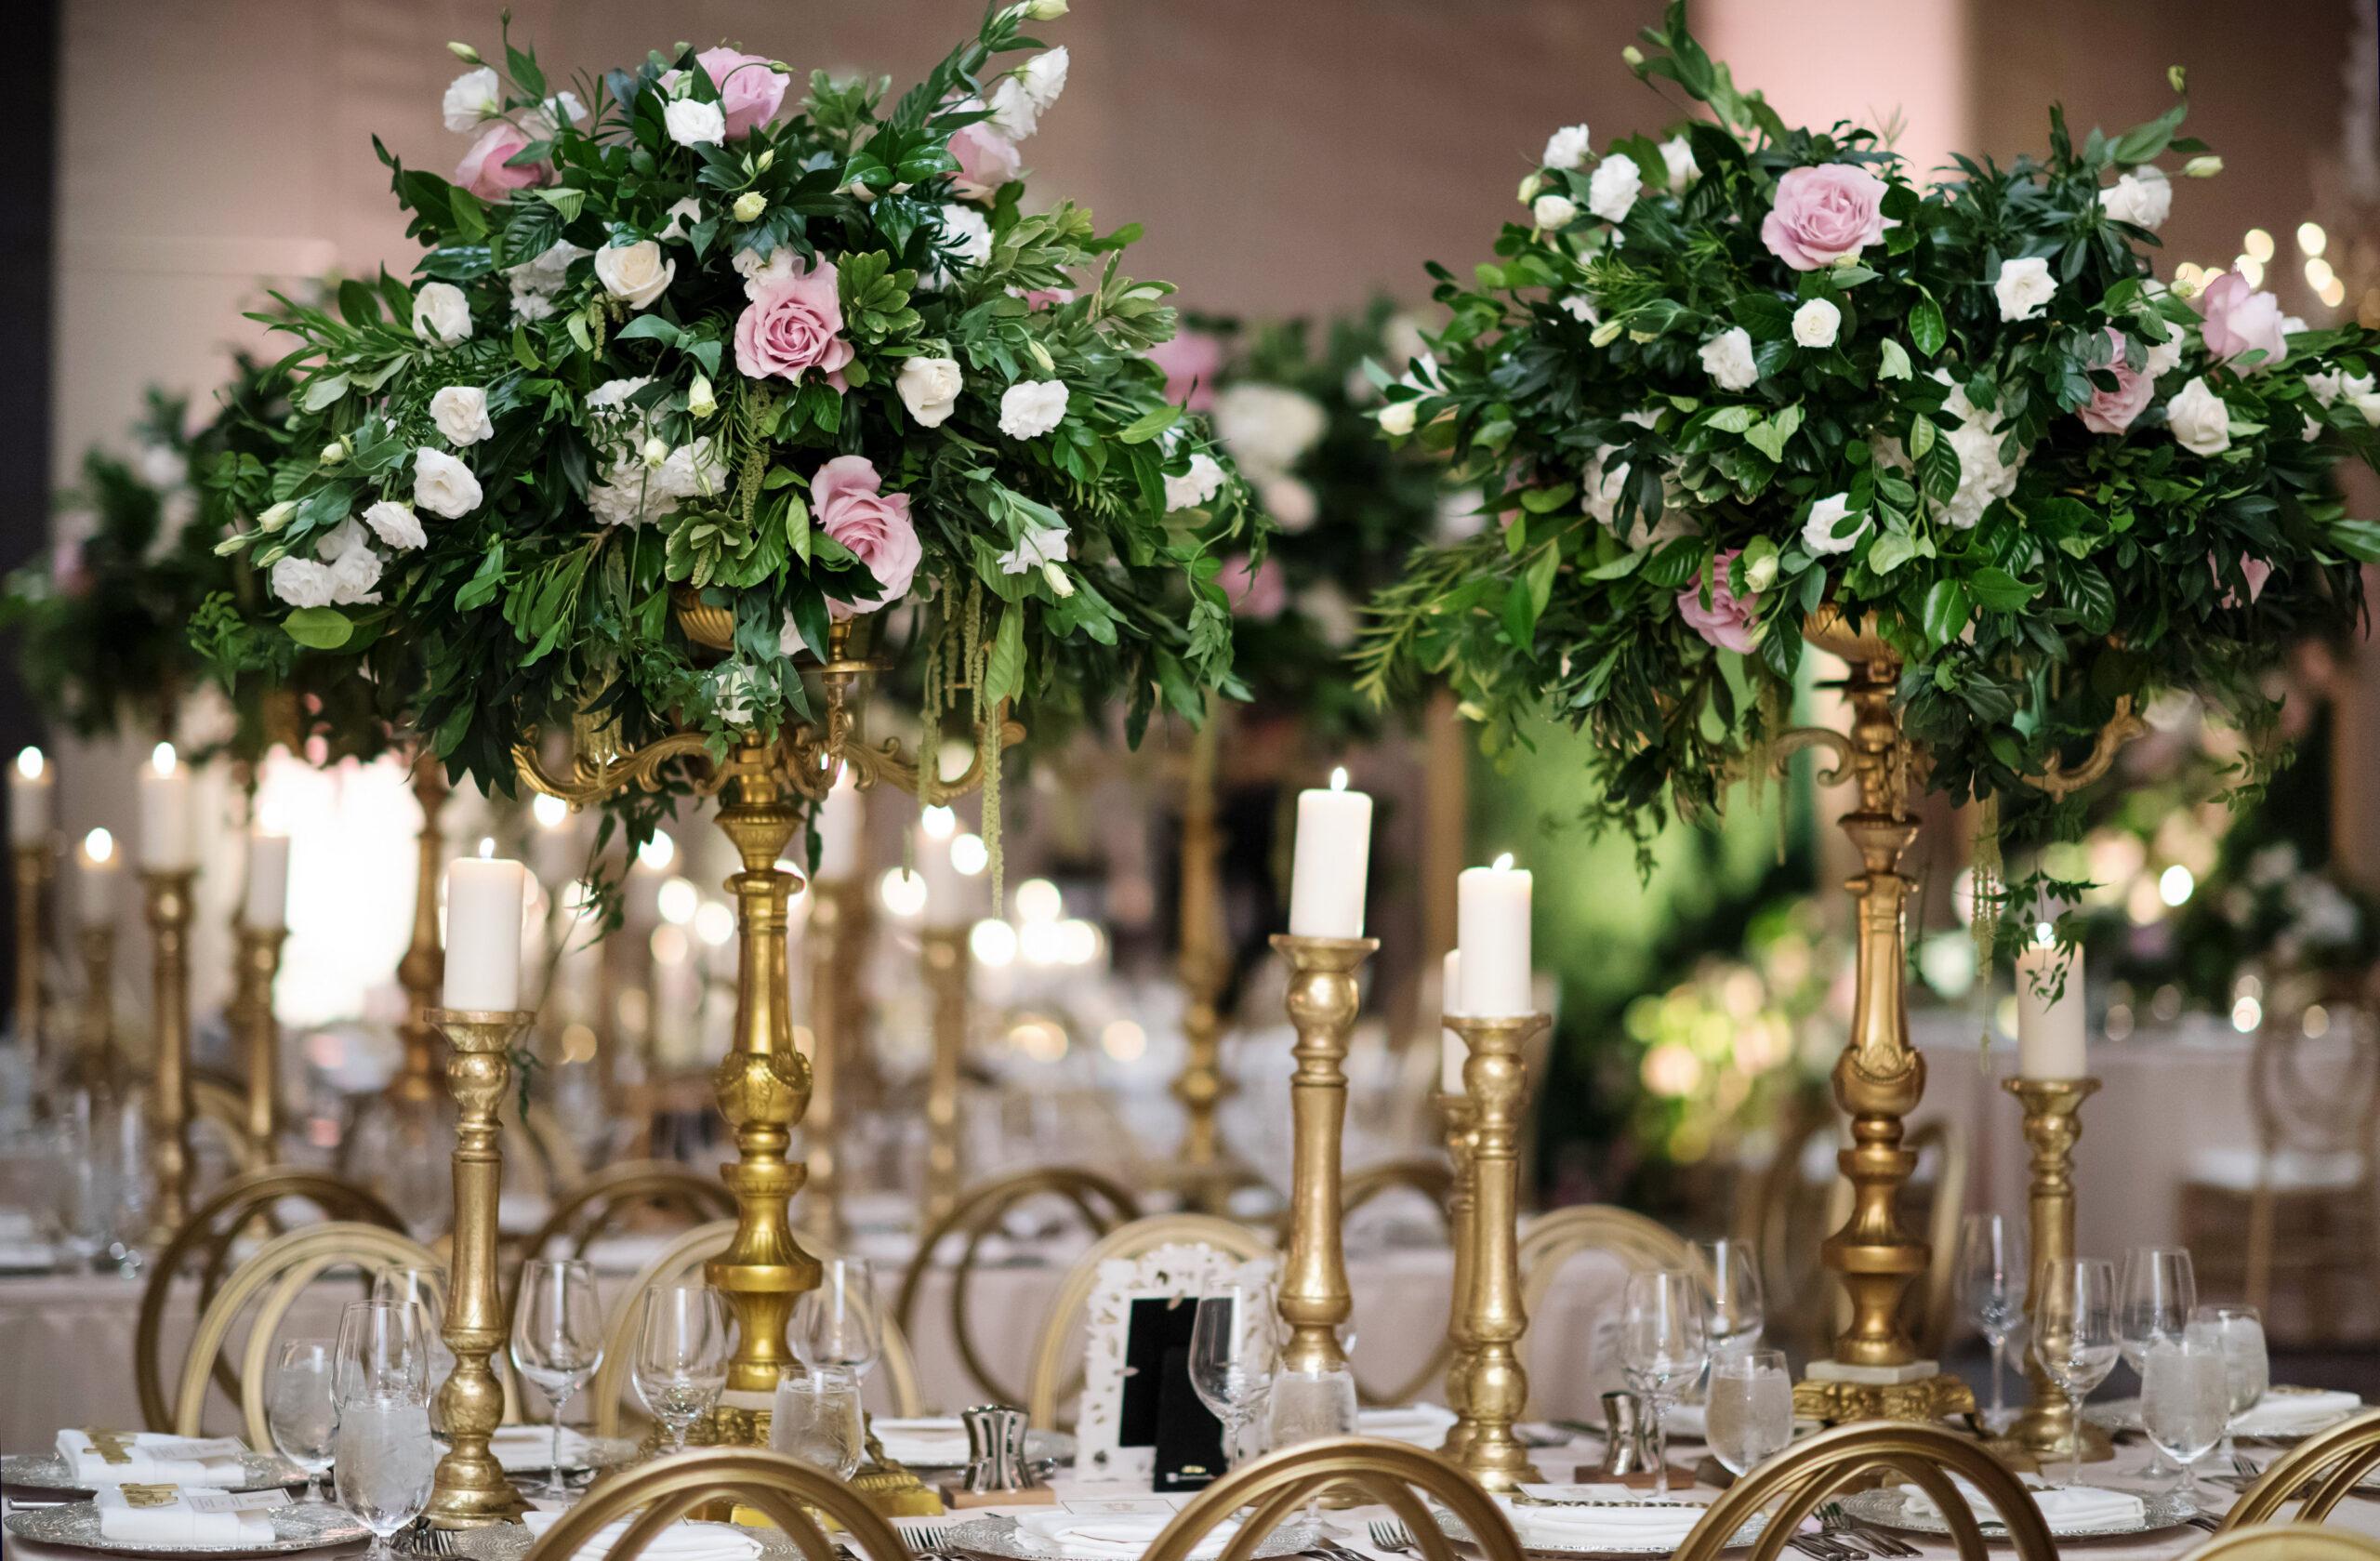 https://secureservercdn.net/45.40.145.151/kgq.ab5.myftpupload.com/wp-content/uploads/2020/04/Sanam-Soroush-s-Wedding-wedluxe-submission-0090-scaled.jpg?time=1620980216